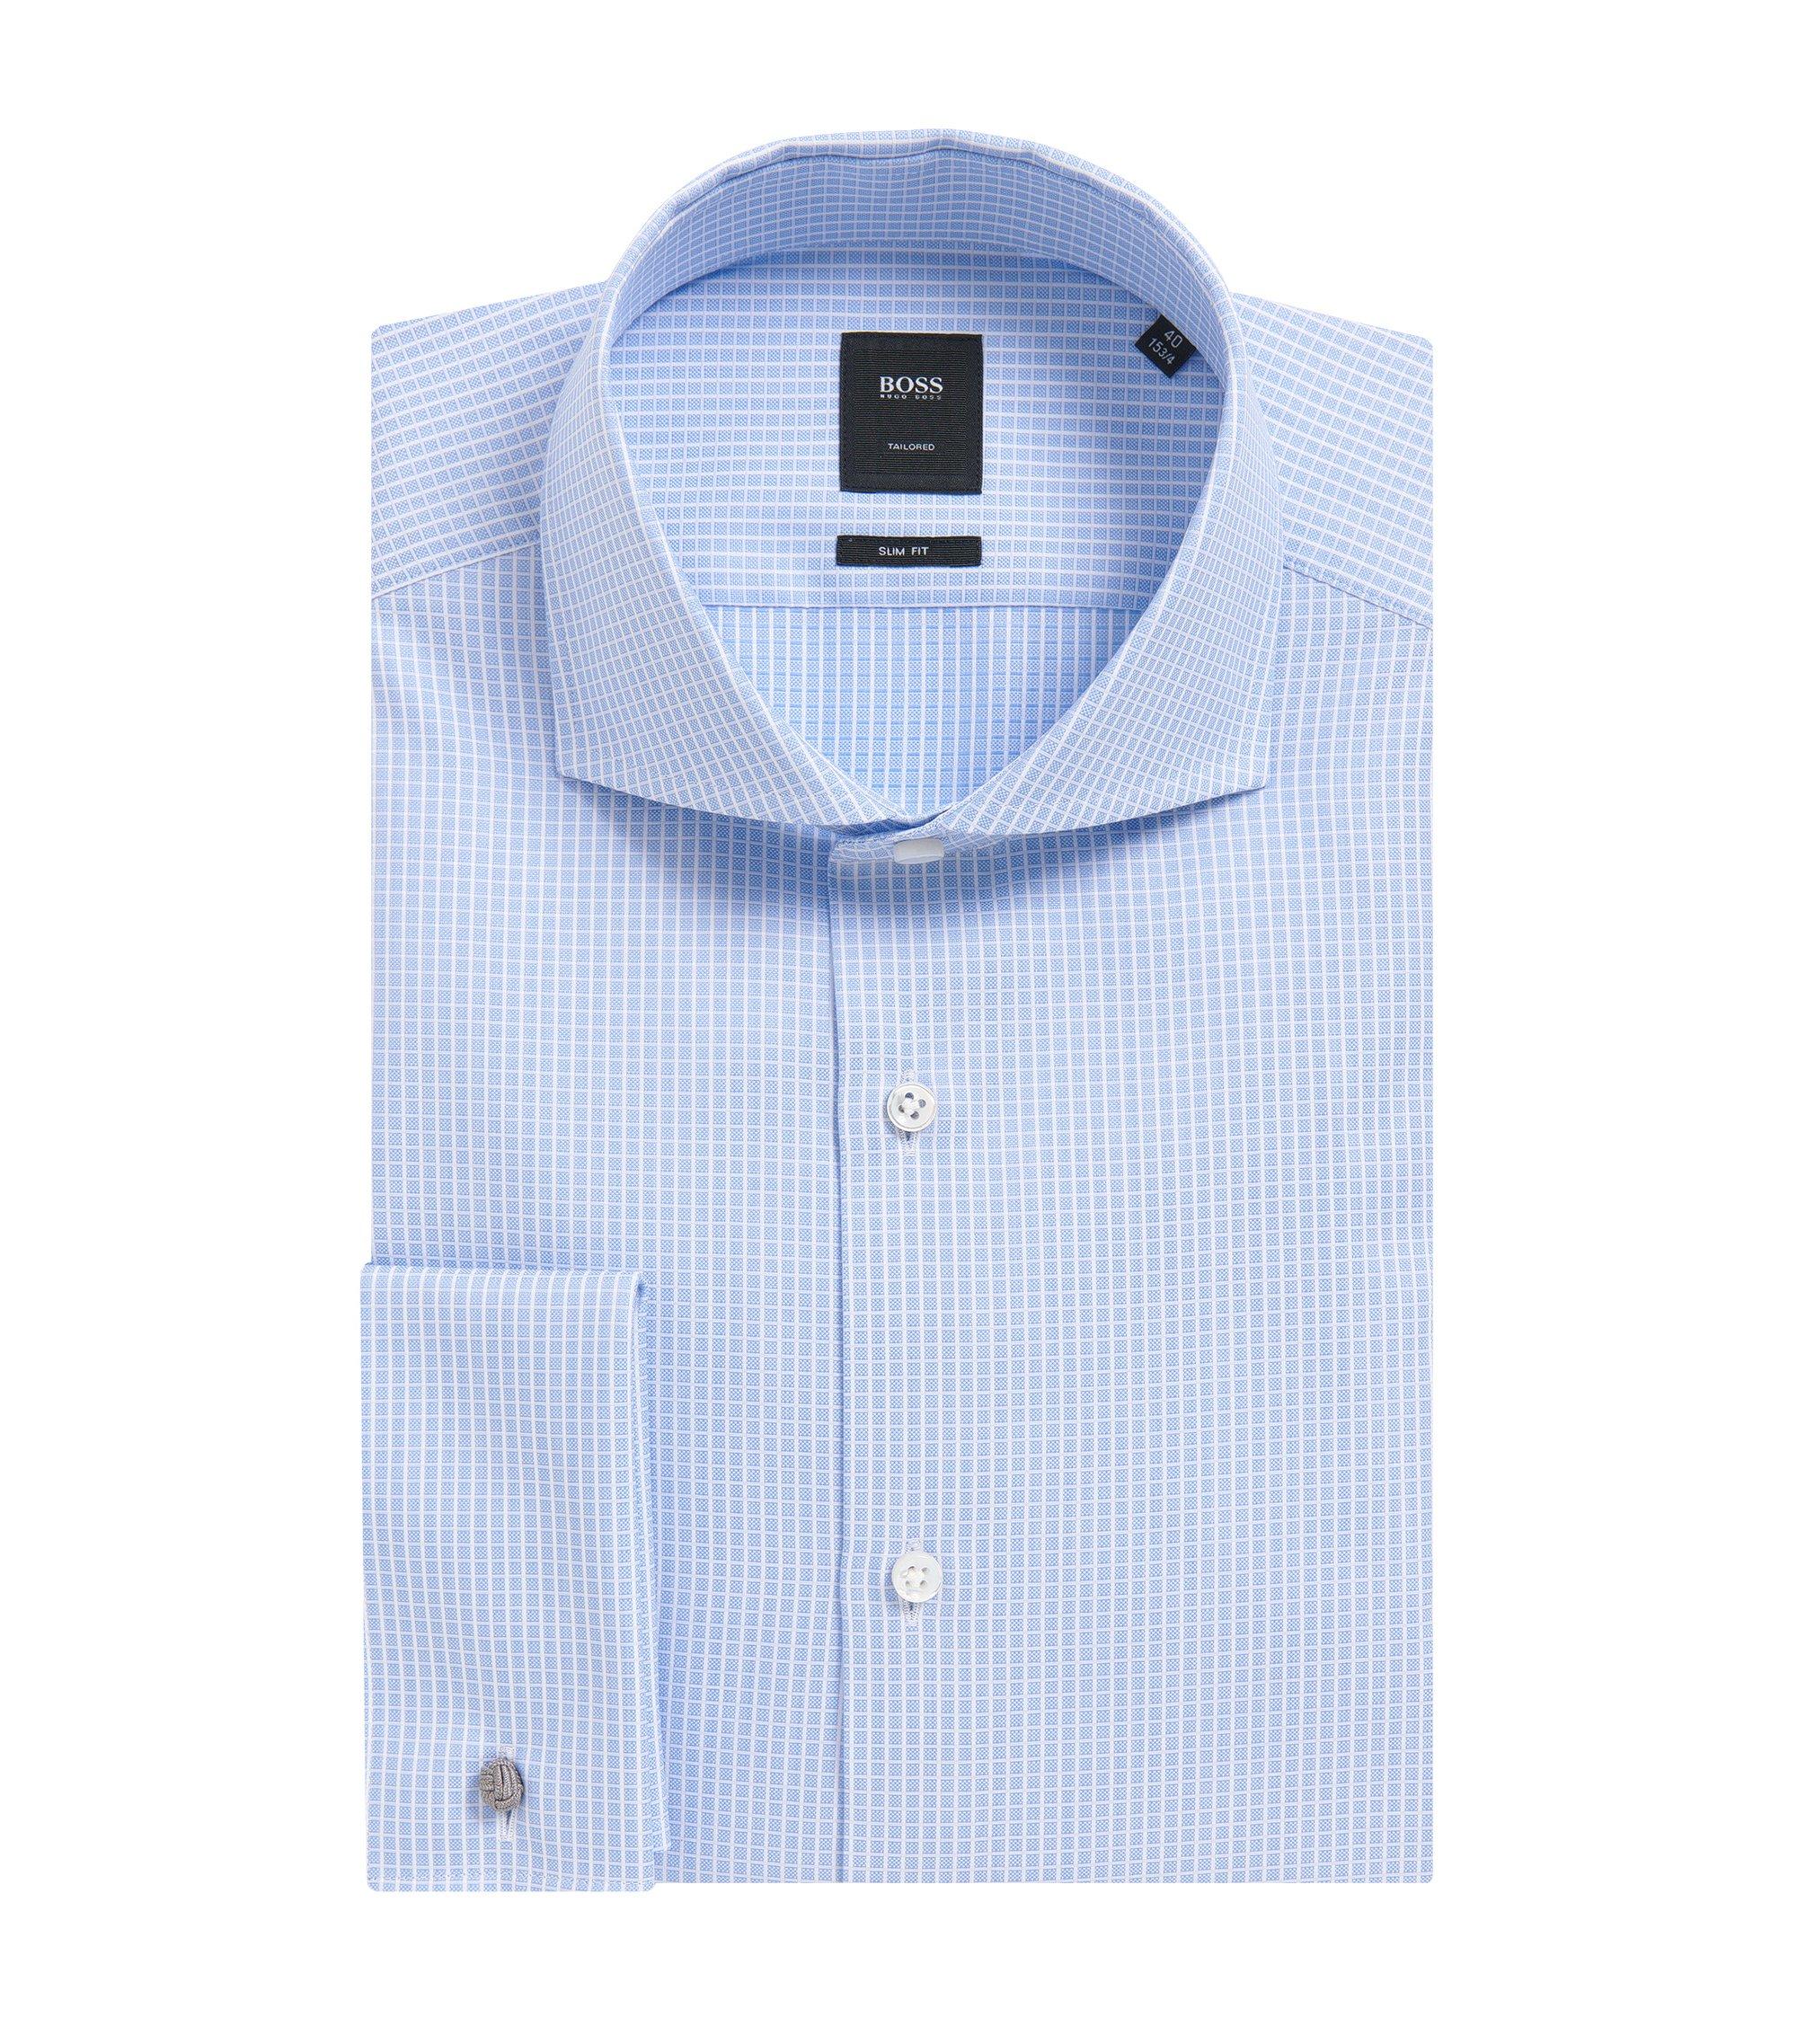 'T-Yacob' | Slim Fit, French Cuff Graph Check Cotton Dress Shirt, Light Blue